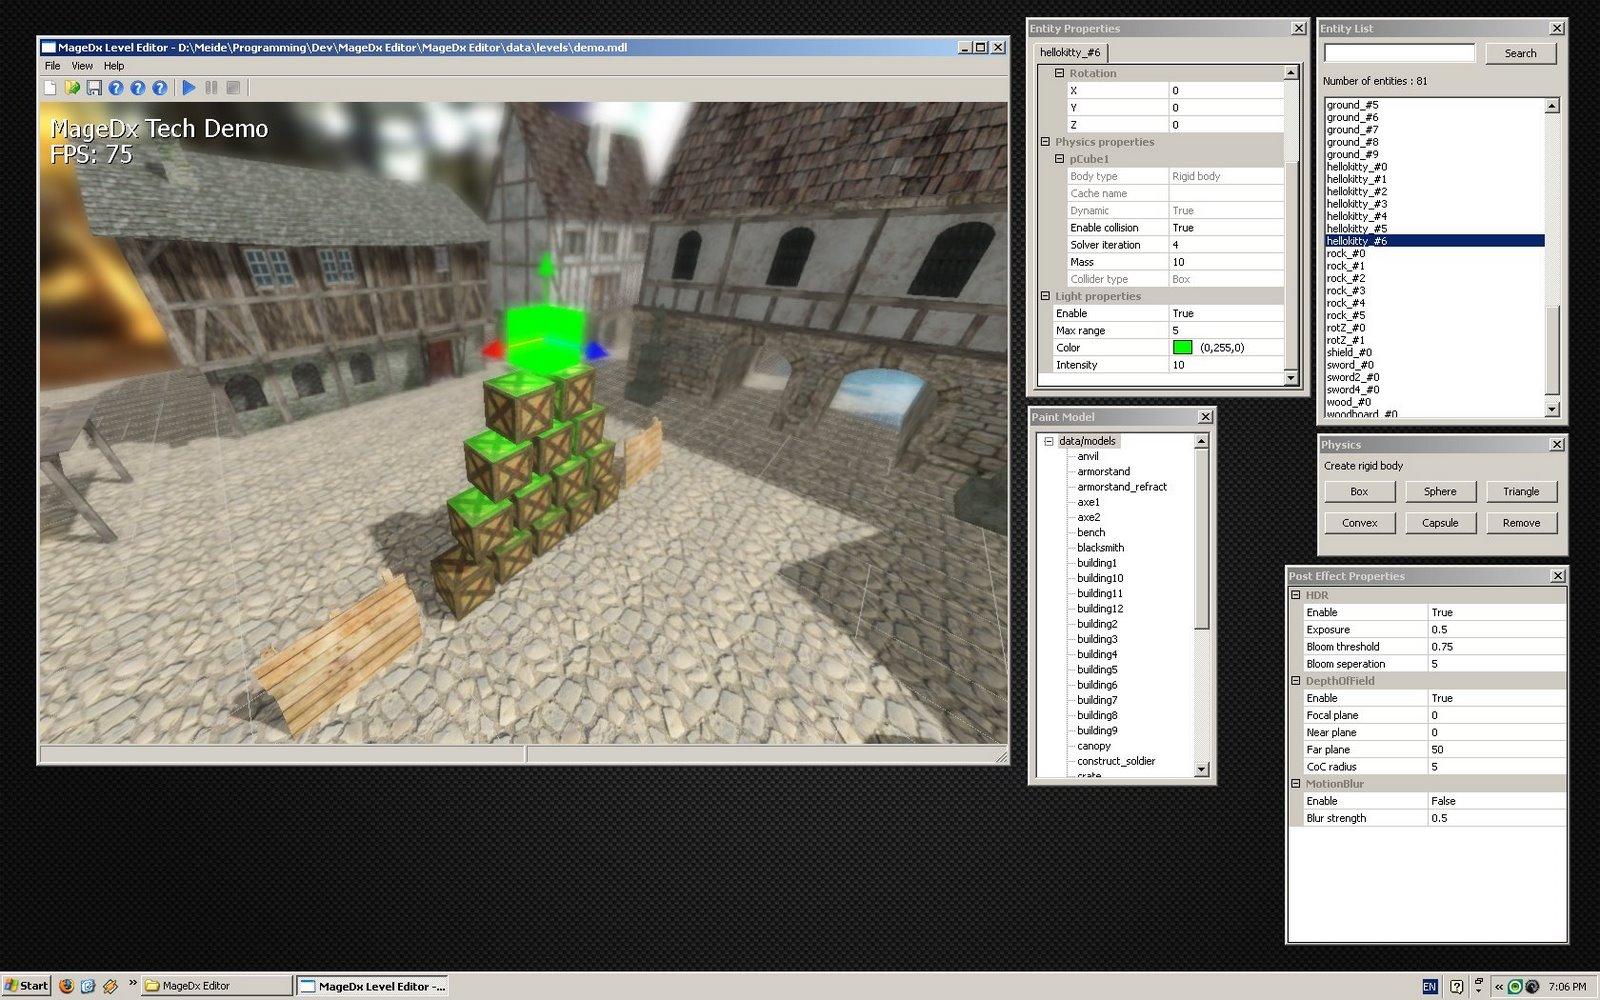 Magedx 3d Graphics Engine Magedx Level Editor: 3d editor